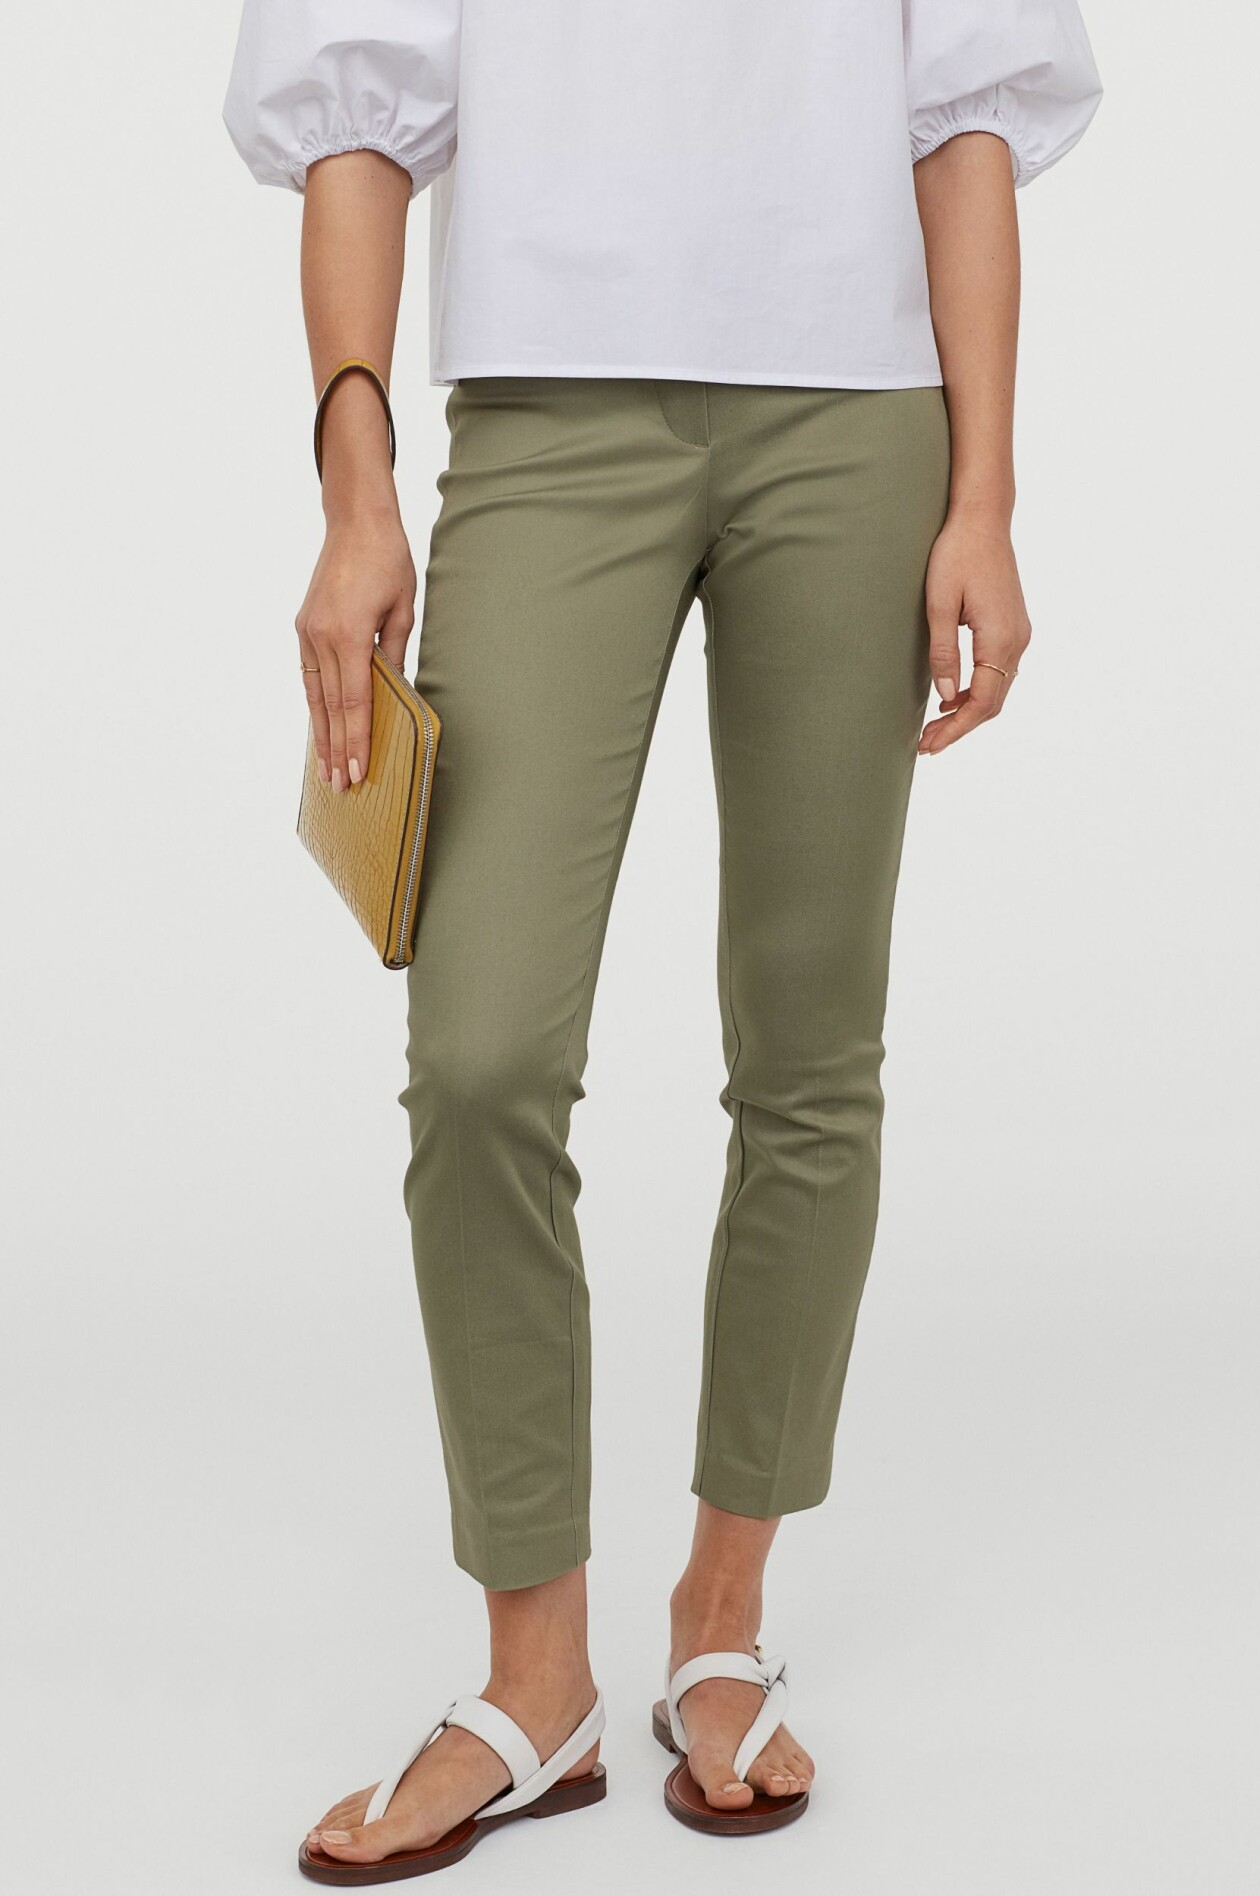 Khakigröna slacks, från H&M